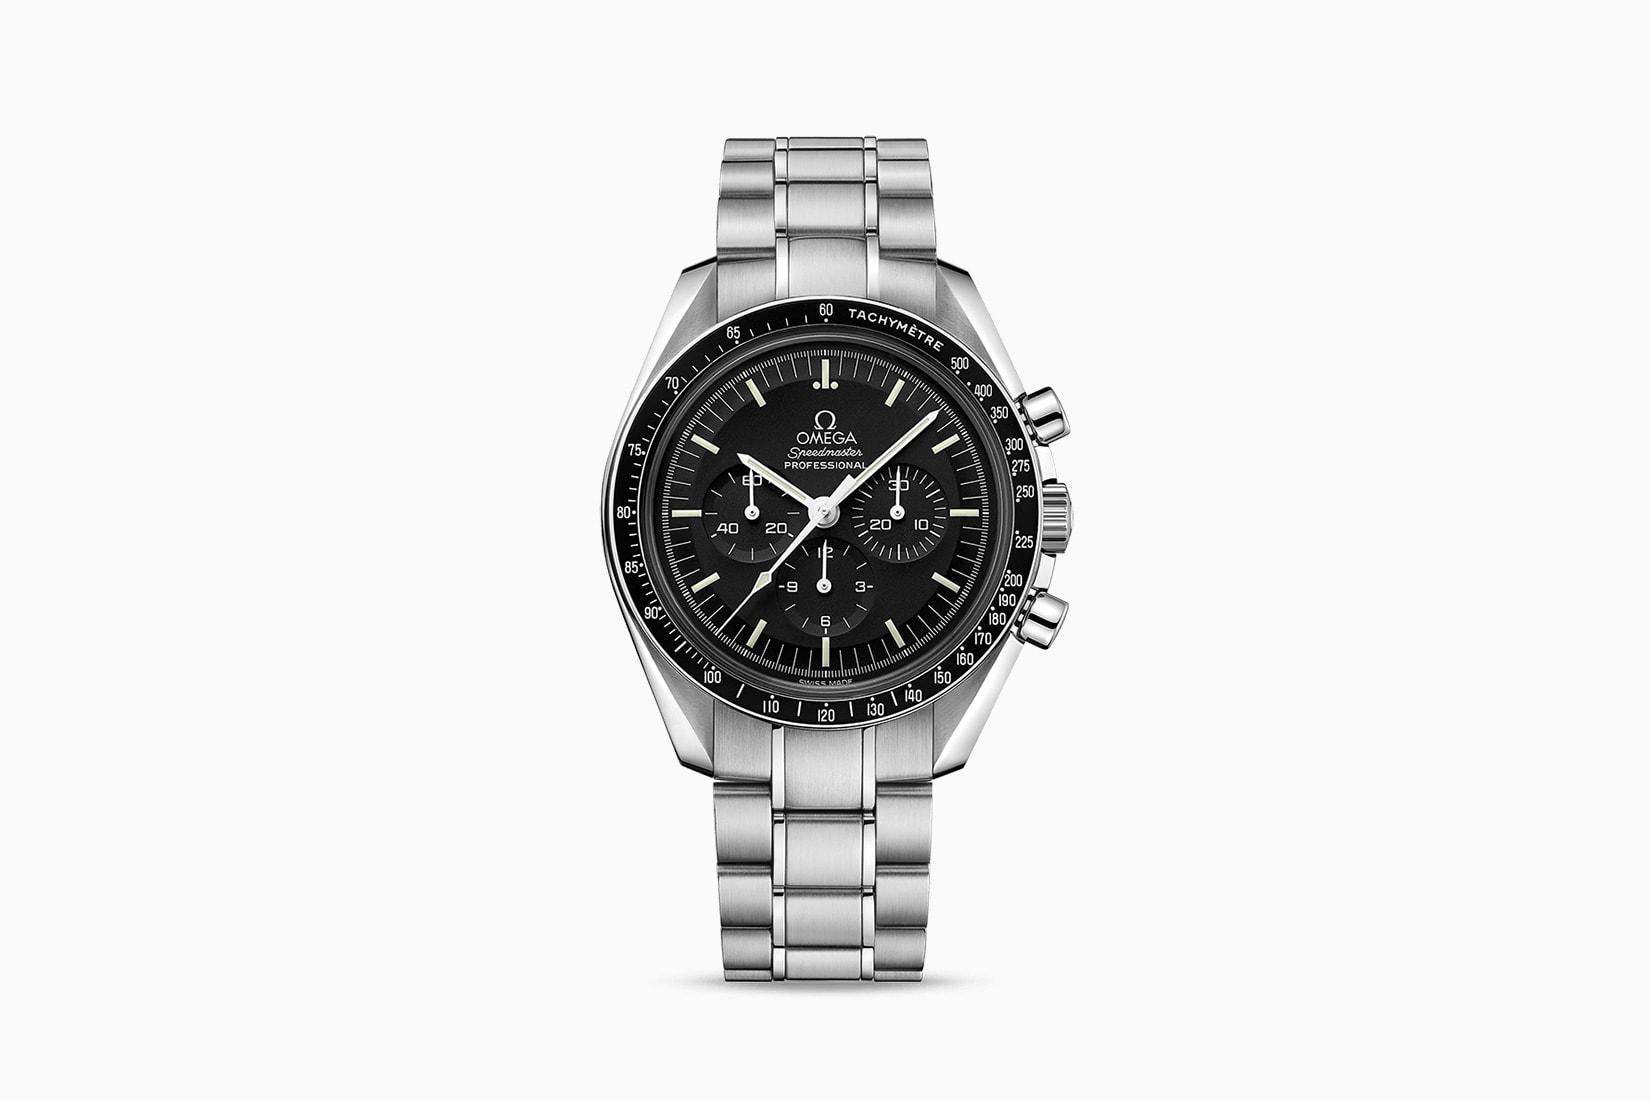 eBay luxury watch authenticity guarantee Omega Speedmaster Moonwatch review - Luxe Digital